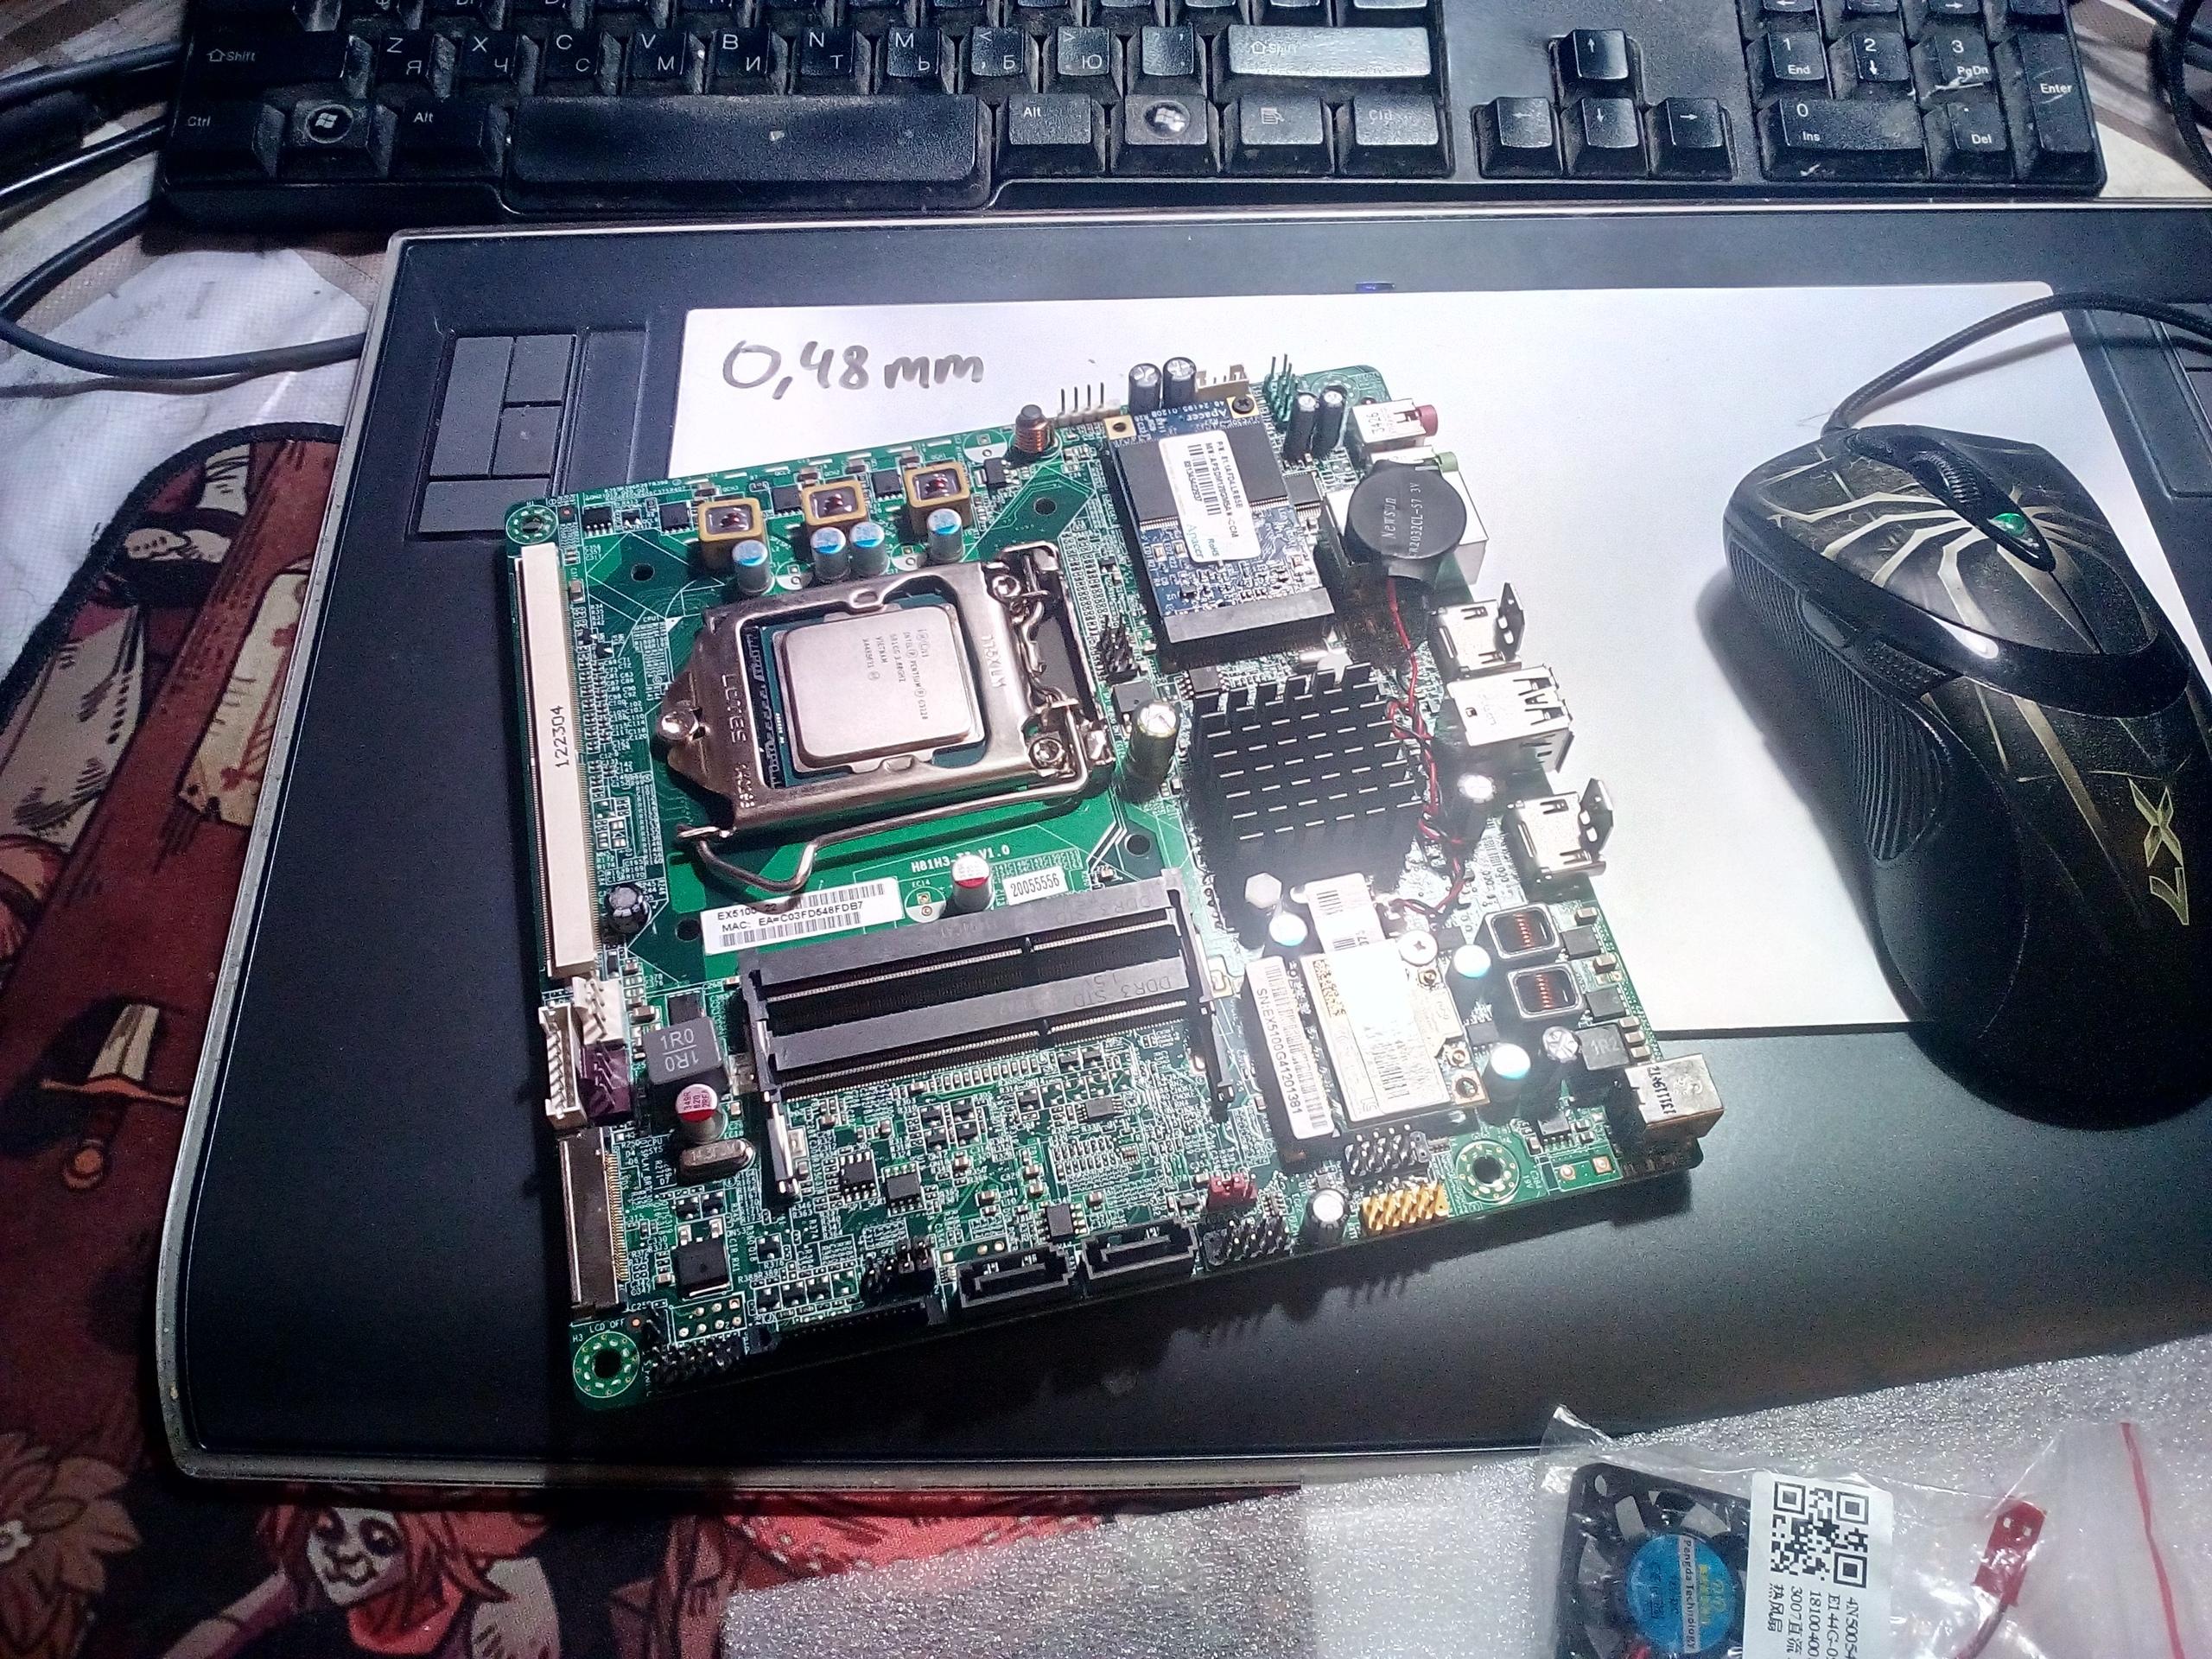 Alienware 766 NVIDIA Quadro Go 1000-FX 128MB Treiber Herunterladen